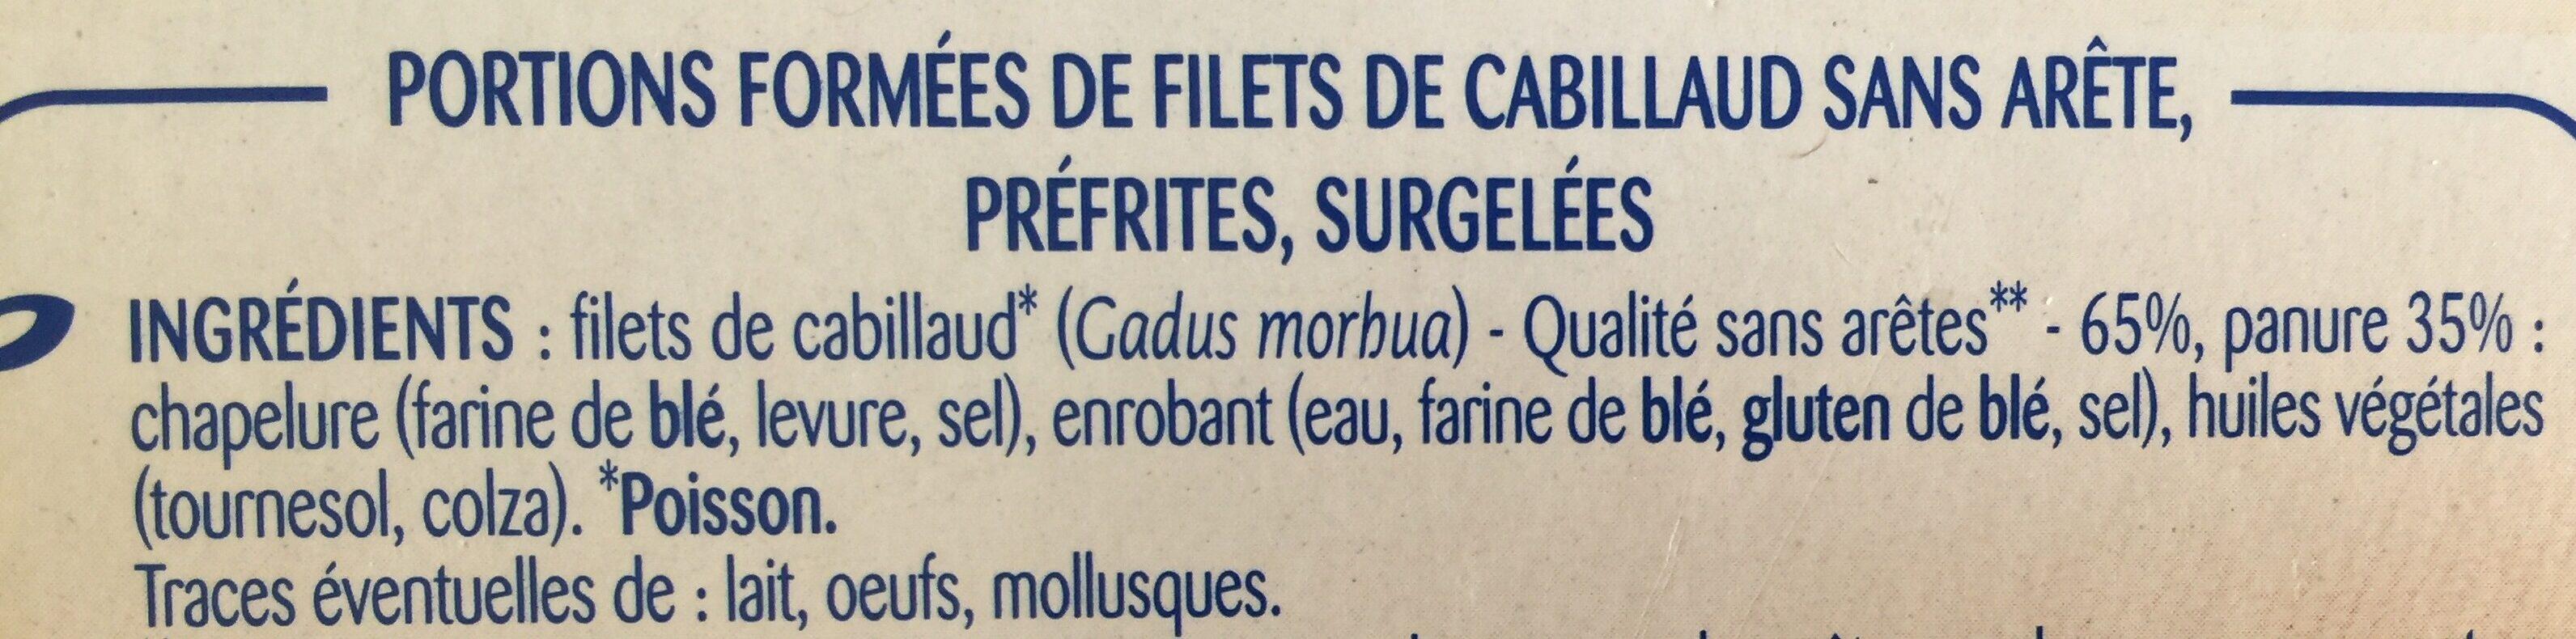 Odyssee, Filet de cabillaud panees, 4 500 g - Ingrédients - fr